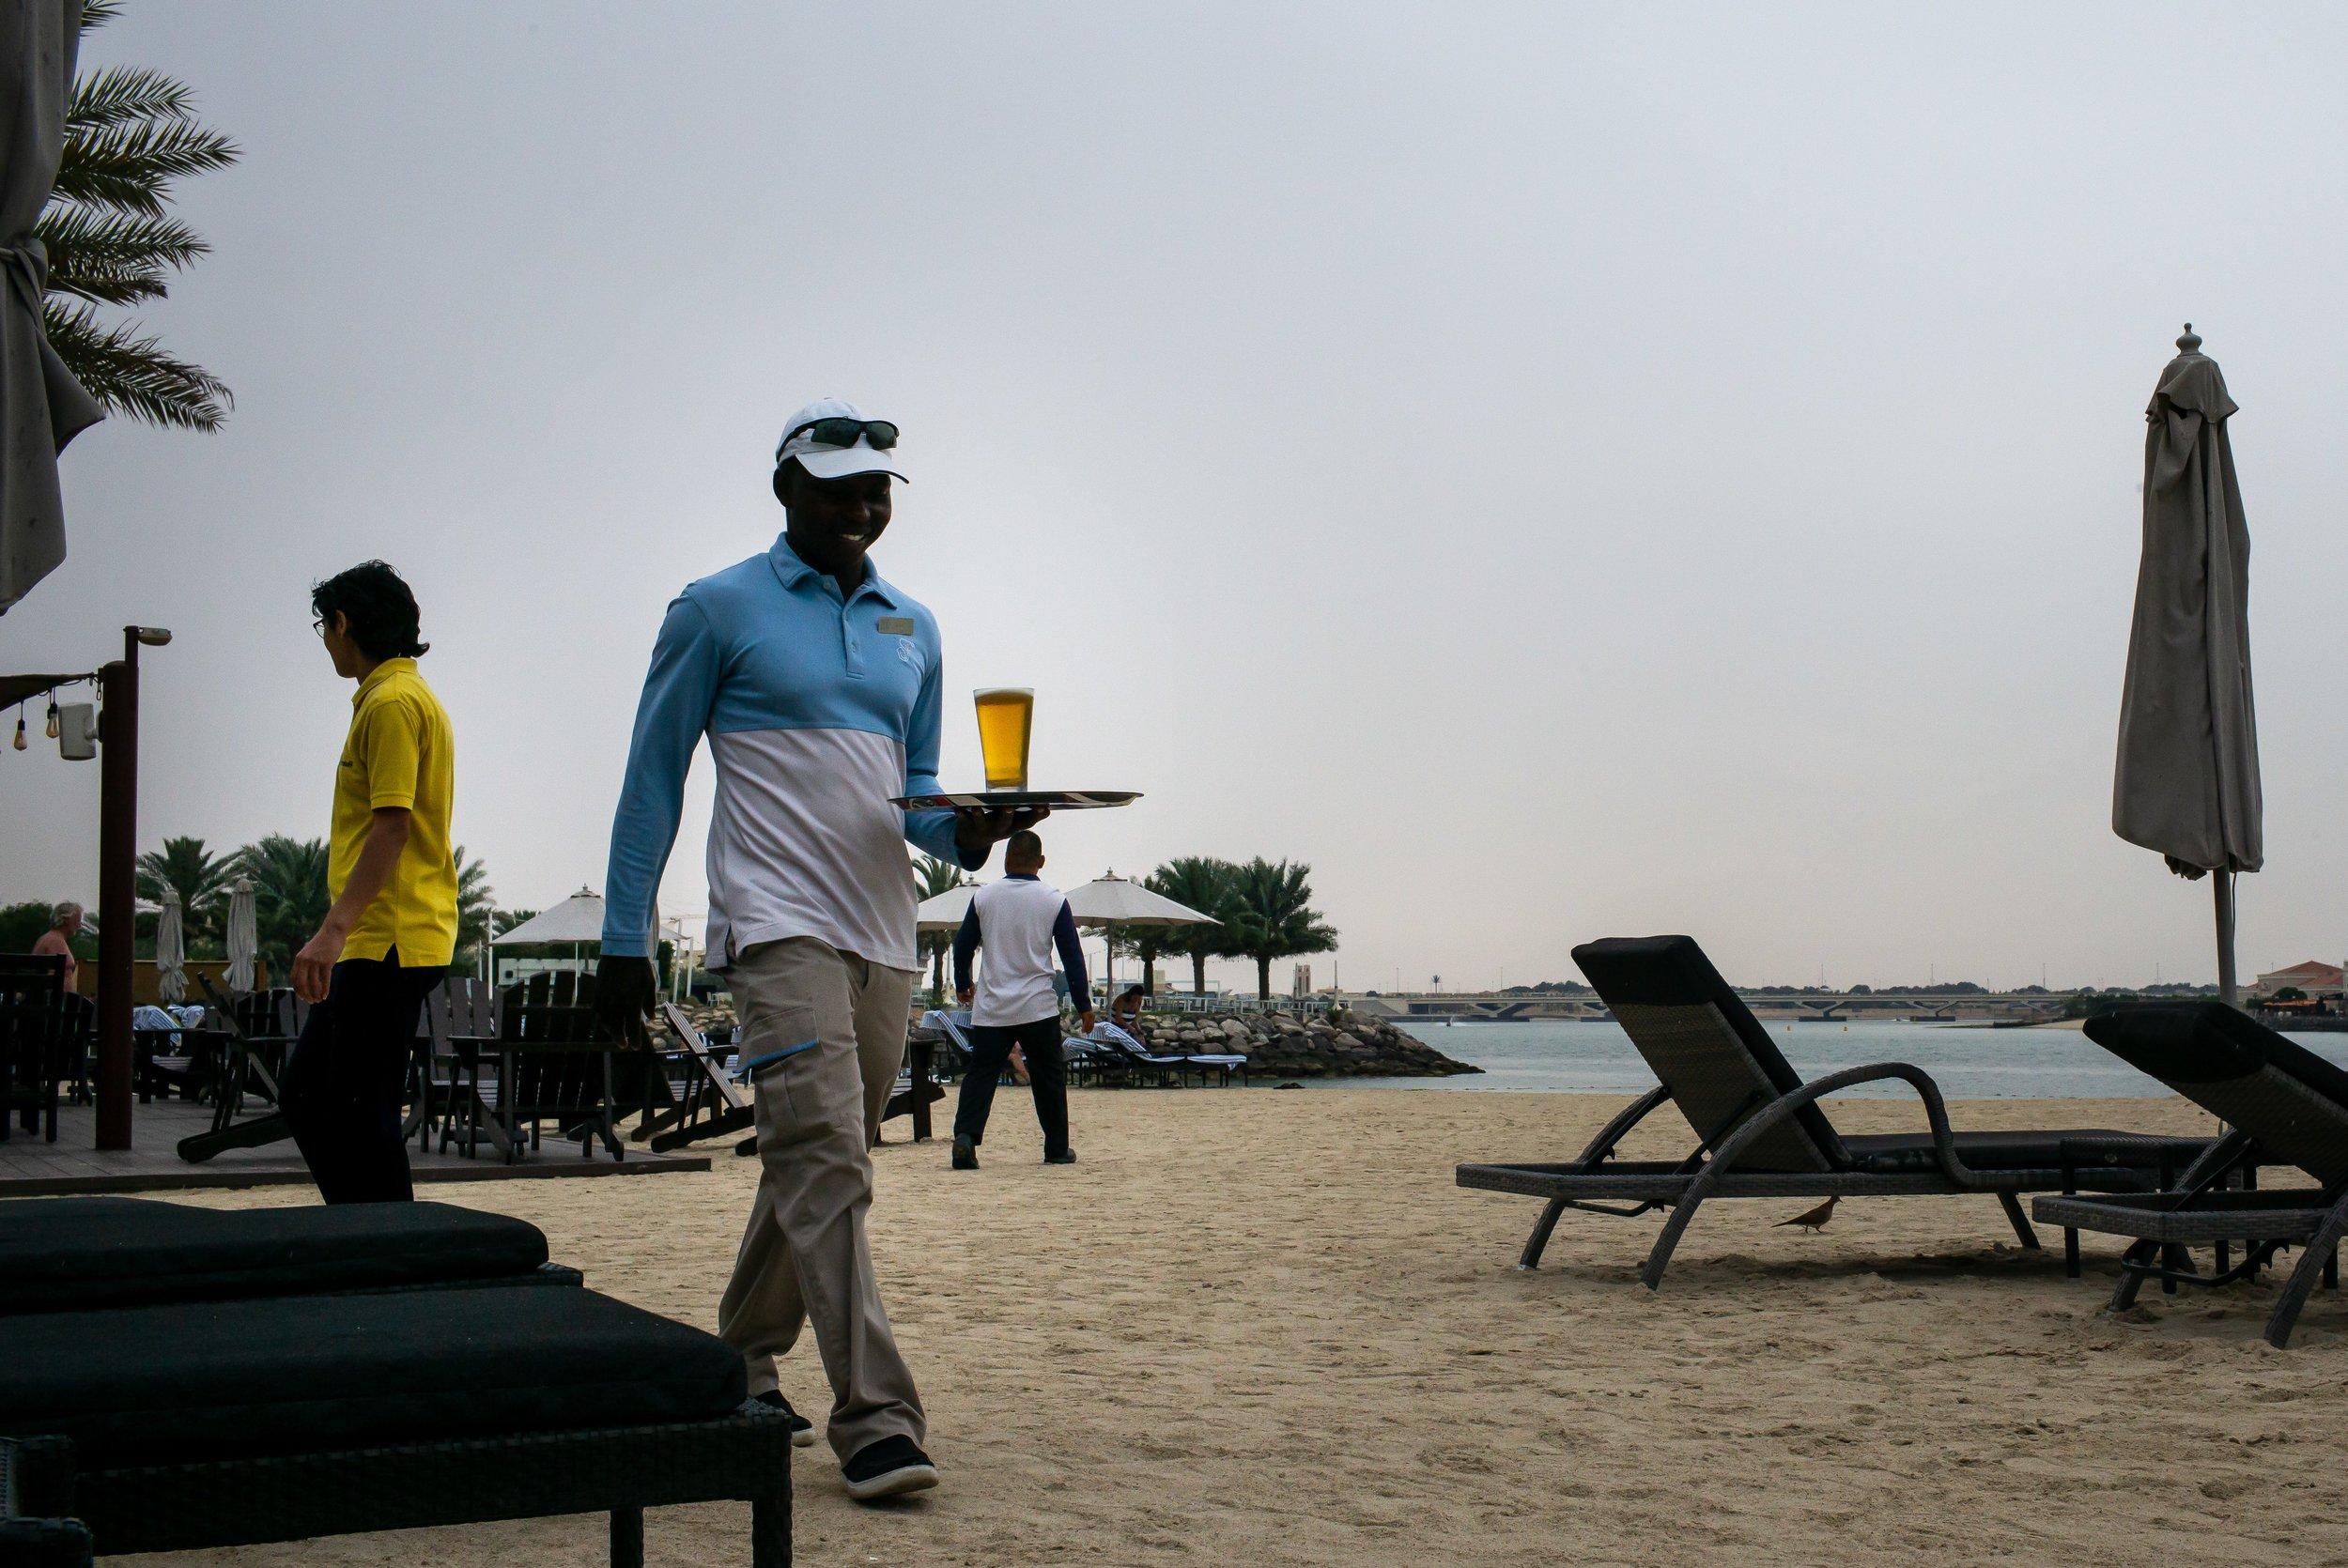 Abu Dhabi Beach 5.jpg